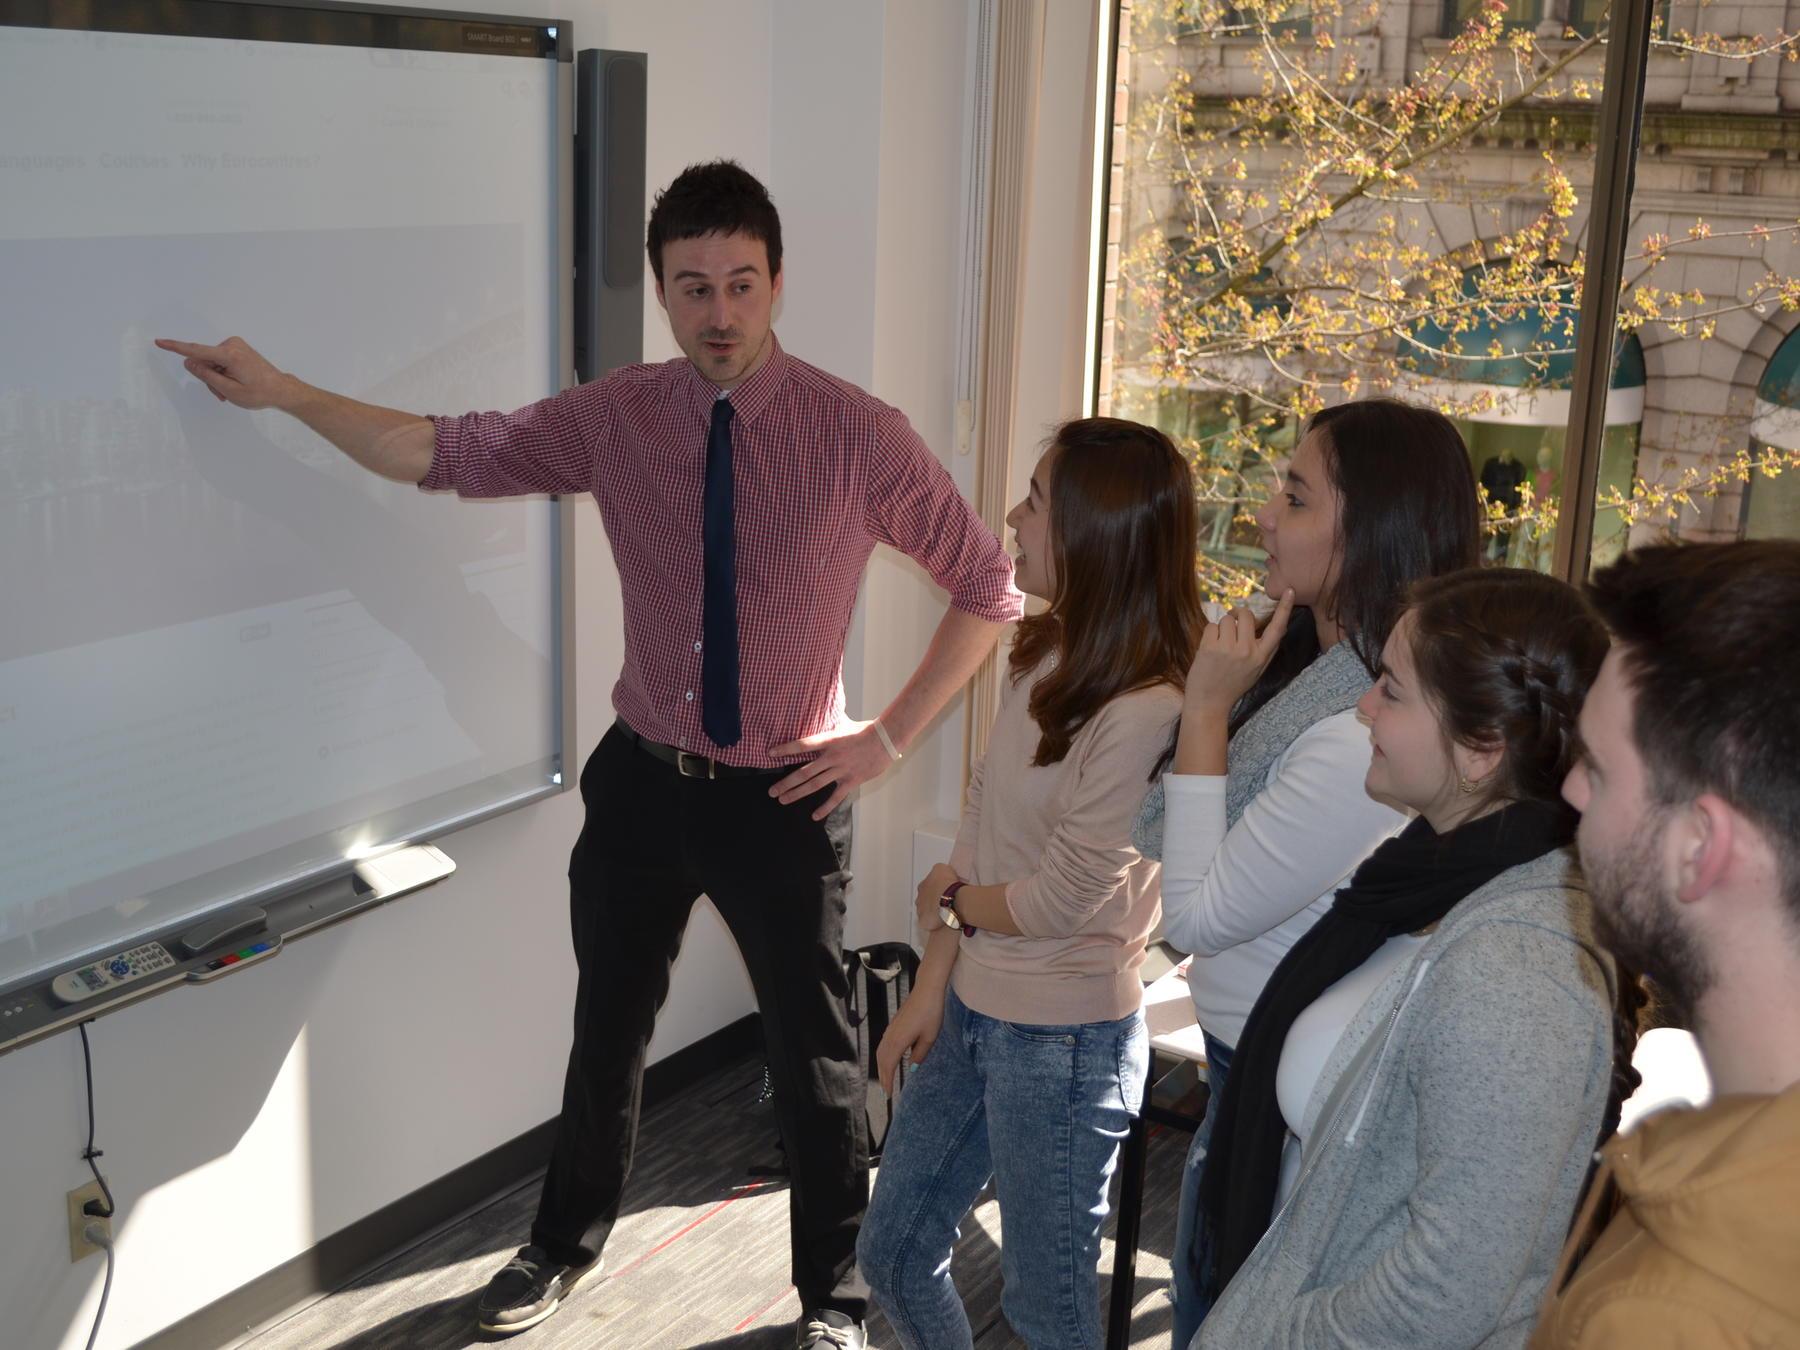 vancouver_school_classroom_02